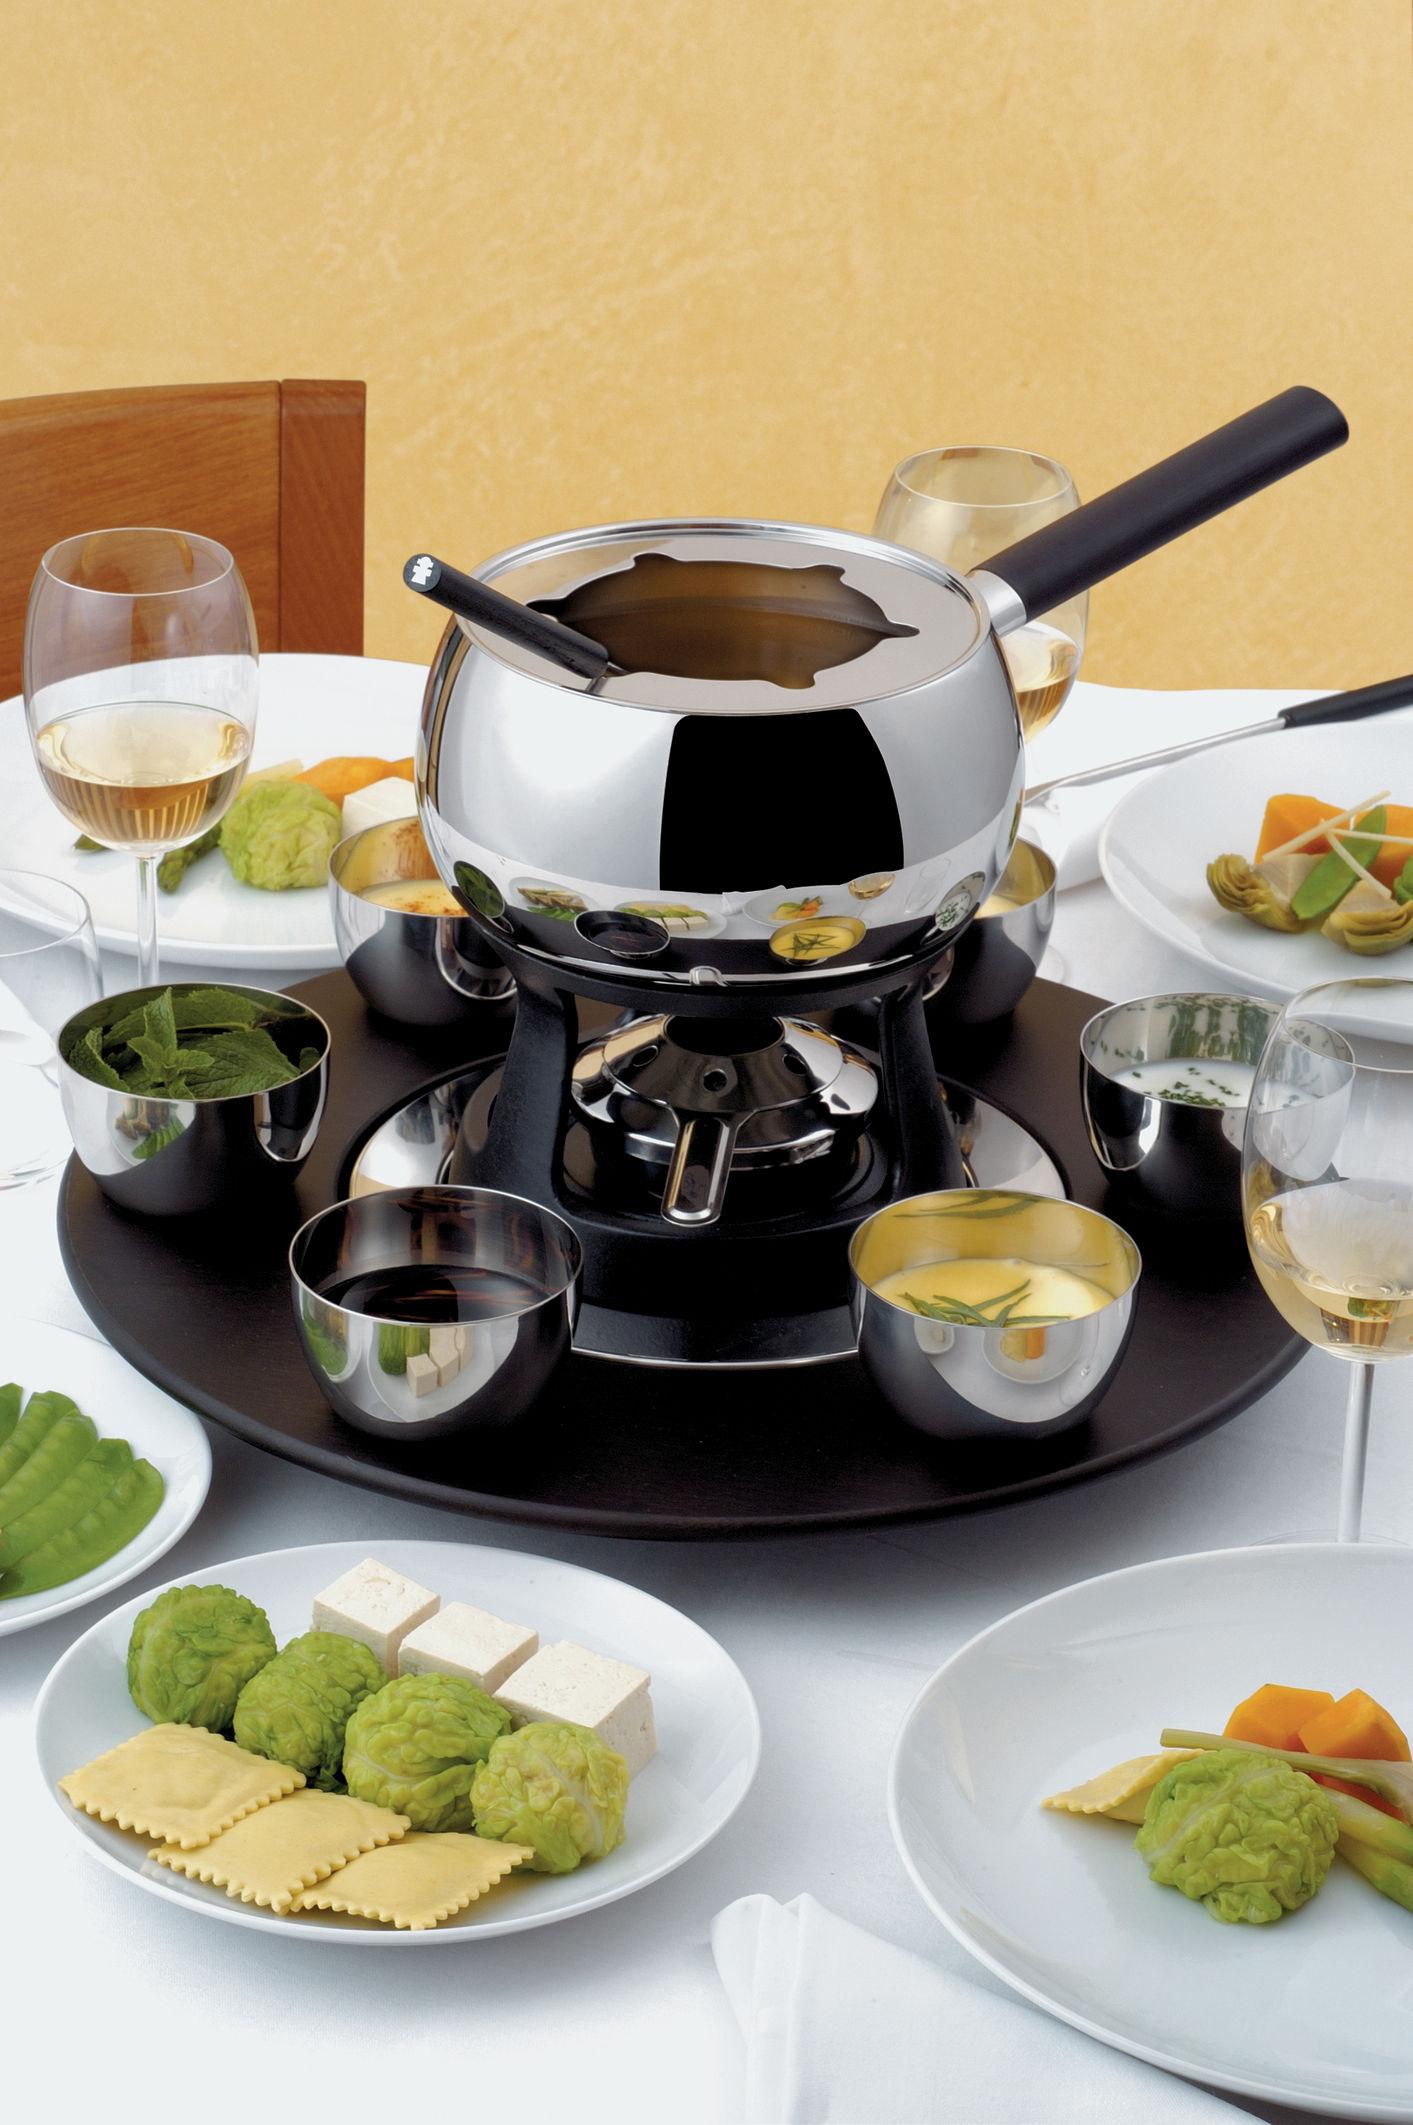 mami fondu service for fondue bourguignonne bourguignonne set by alessi. Black Bedroom Furniture Sets. Home Design Ideas